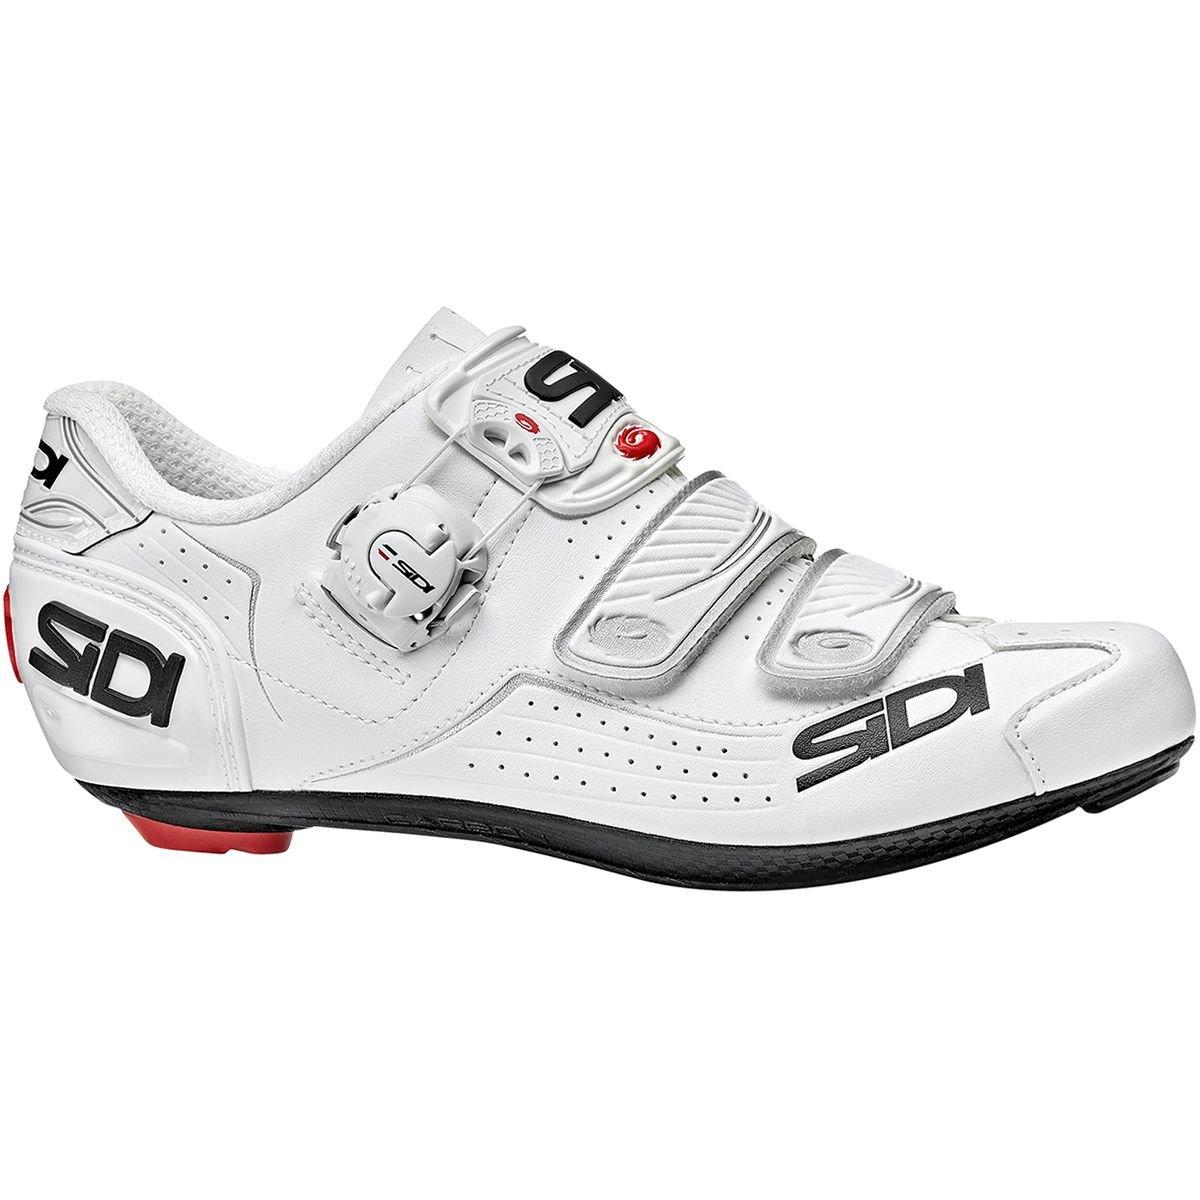 Sidi Alba Shoes Damen WhiteWhite 2019 Schuhe: